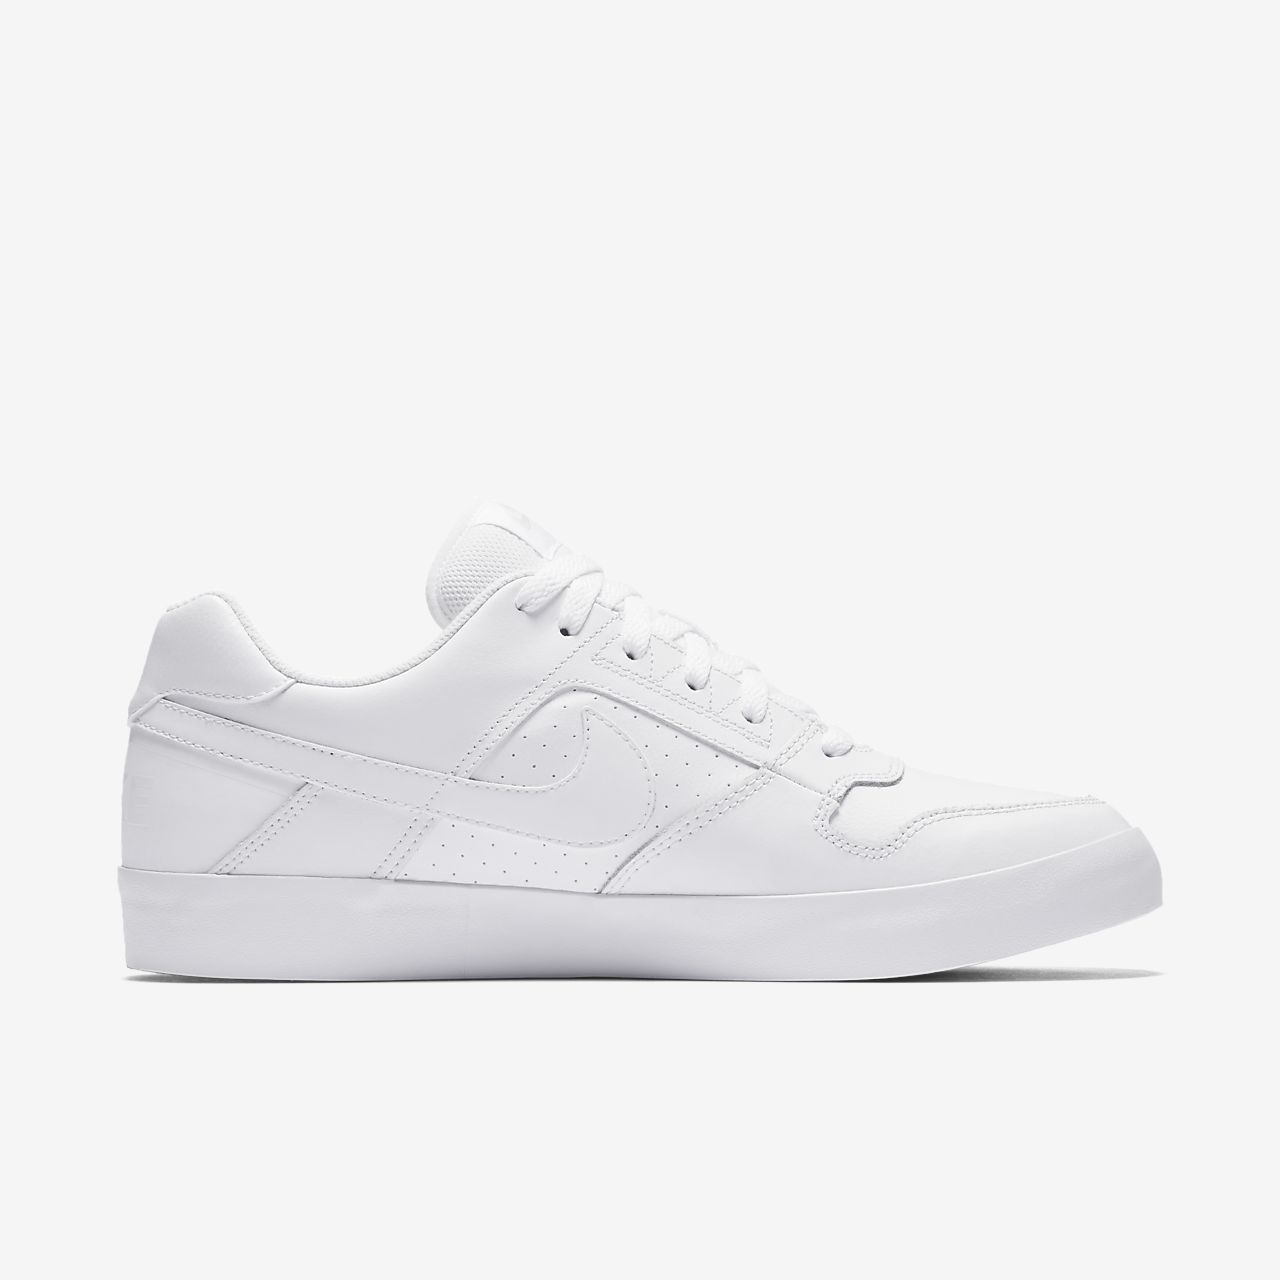 NUOVO Scarpe Nike SB Koston hypervulc Scarpe da Uomo Premium Sneaker Scarpe da ginnastica sale